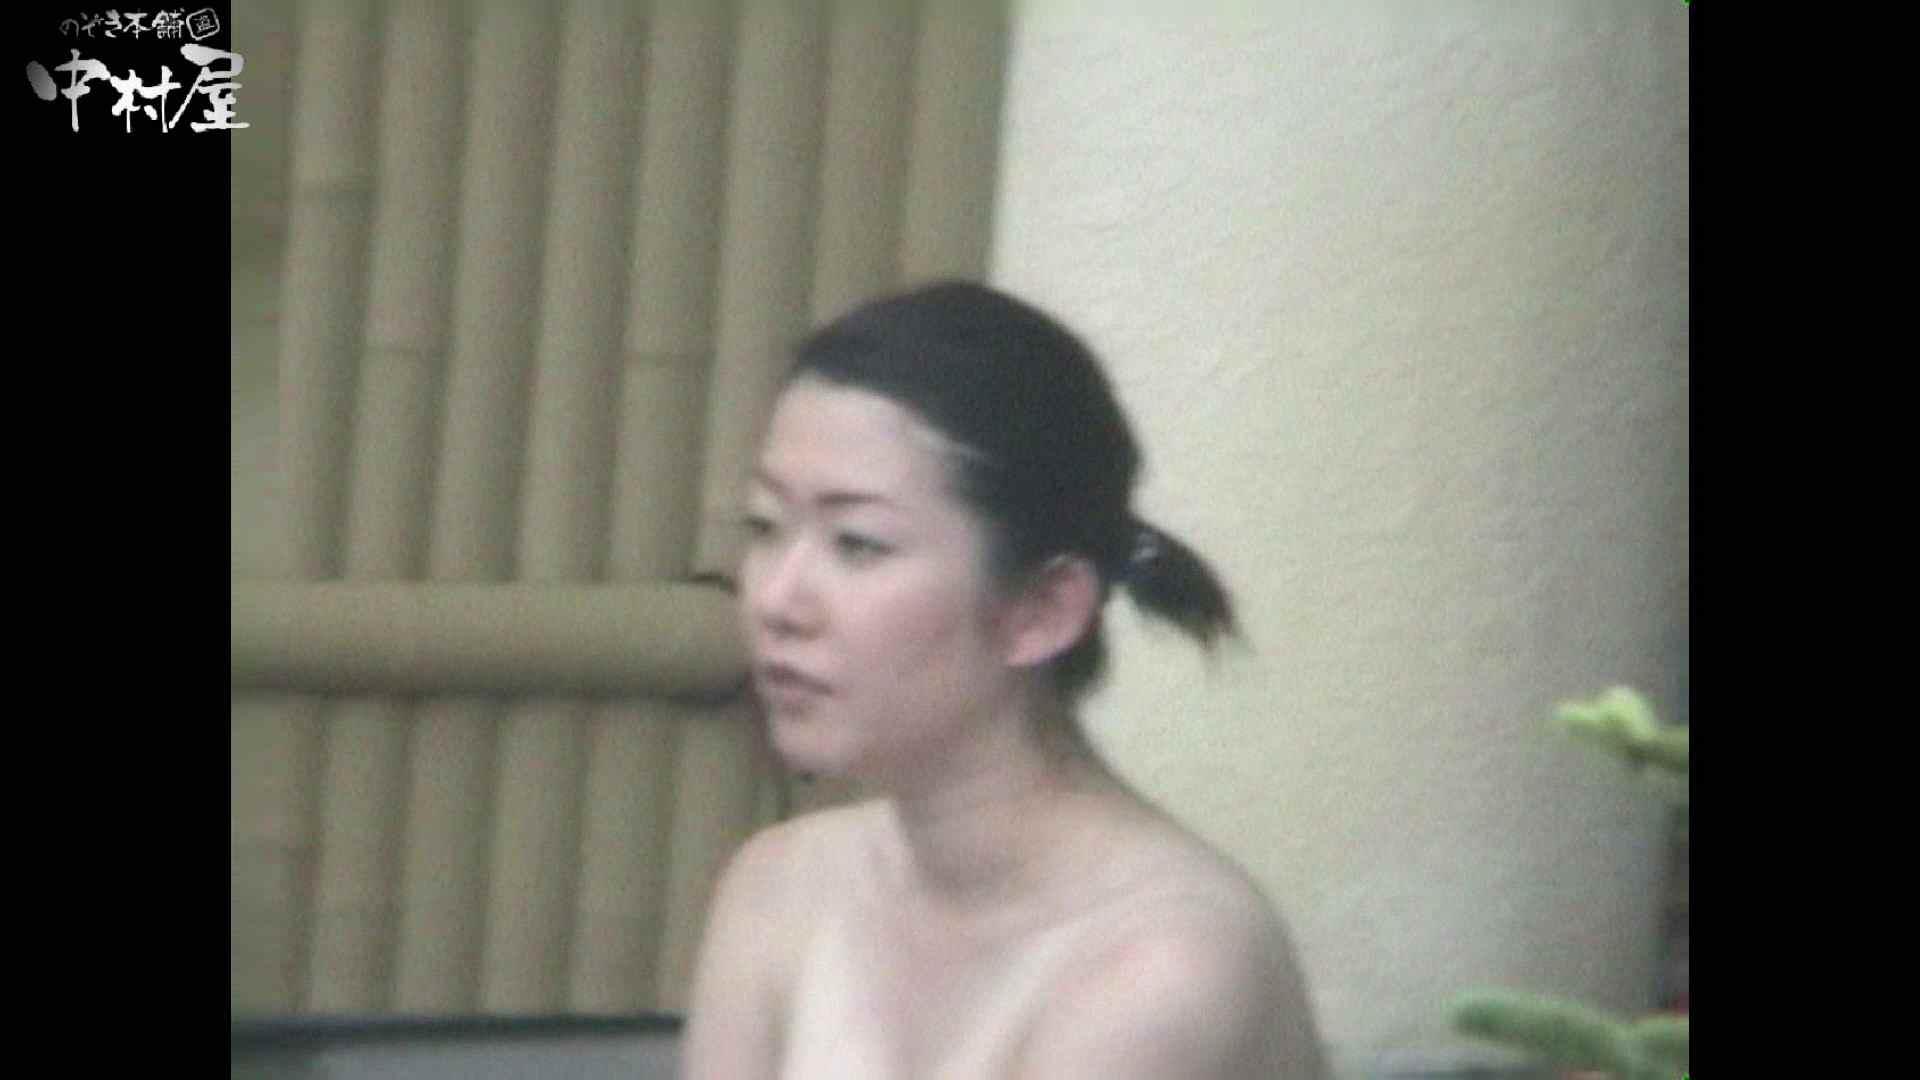 Aquaな露天風呂Vol.961 OLセックス  86画像 24